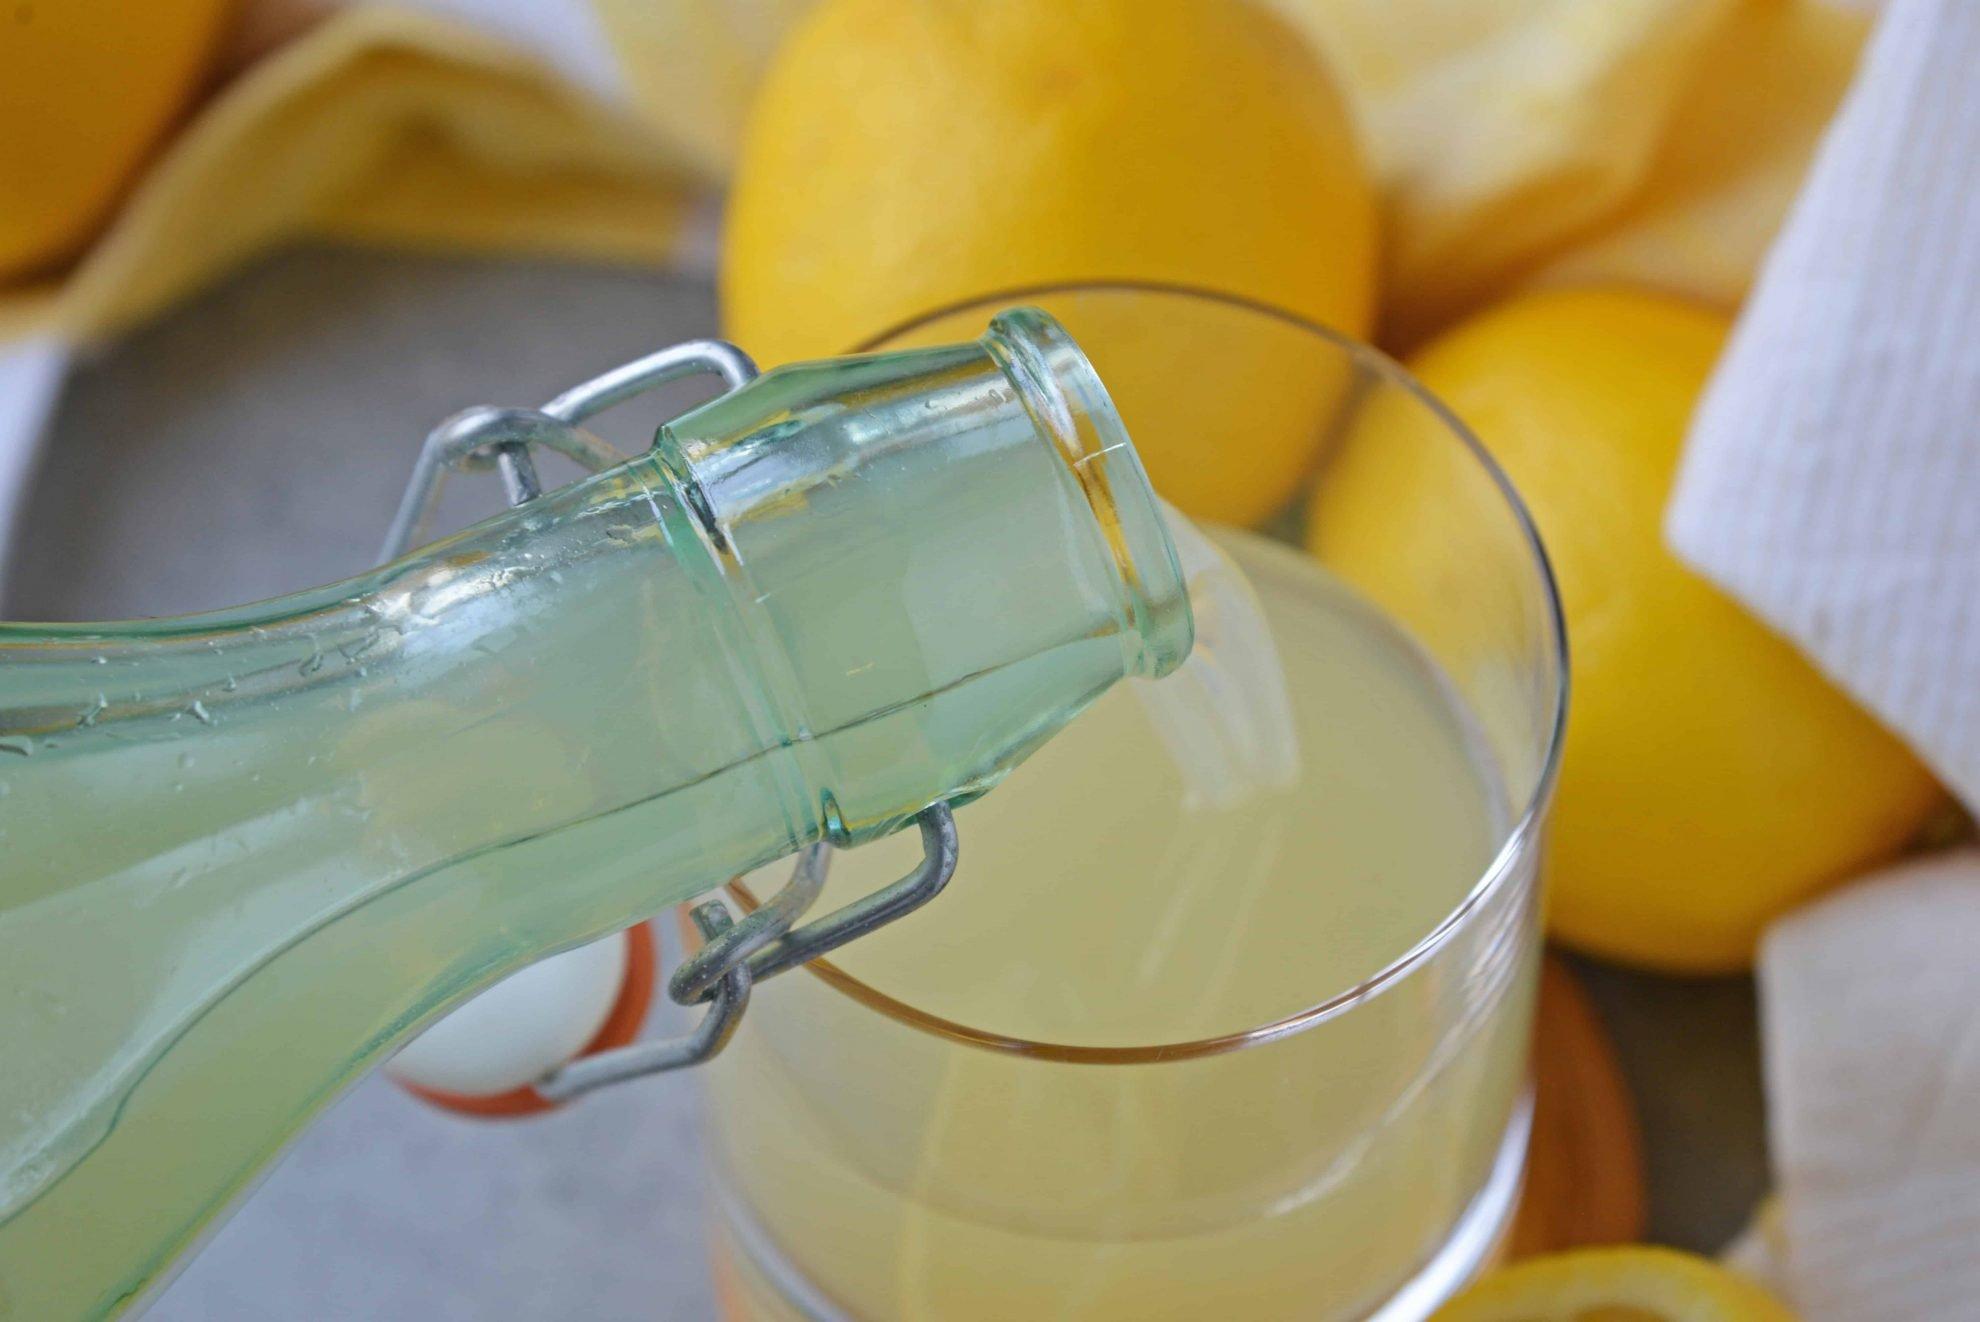 pouring limoncello into a glass